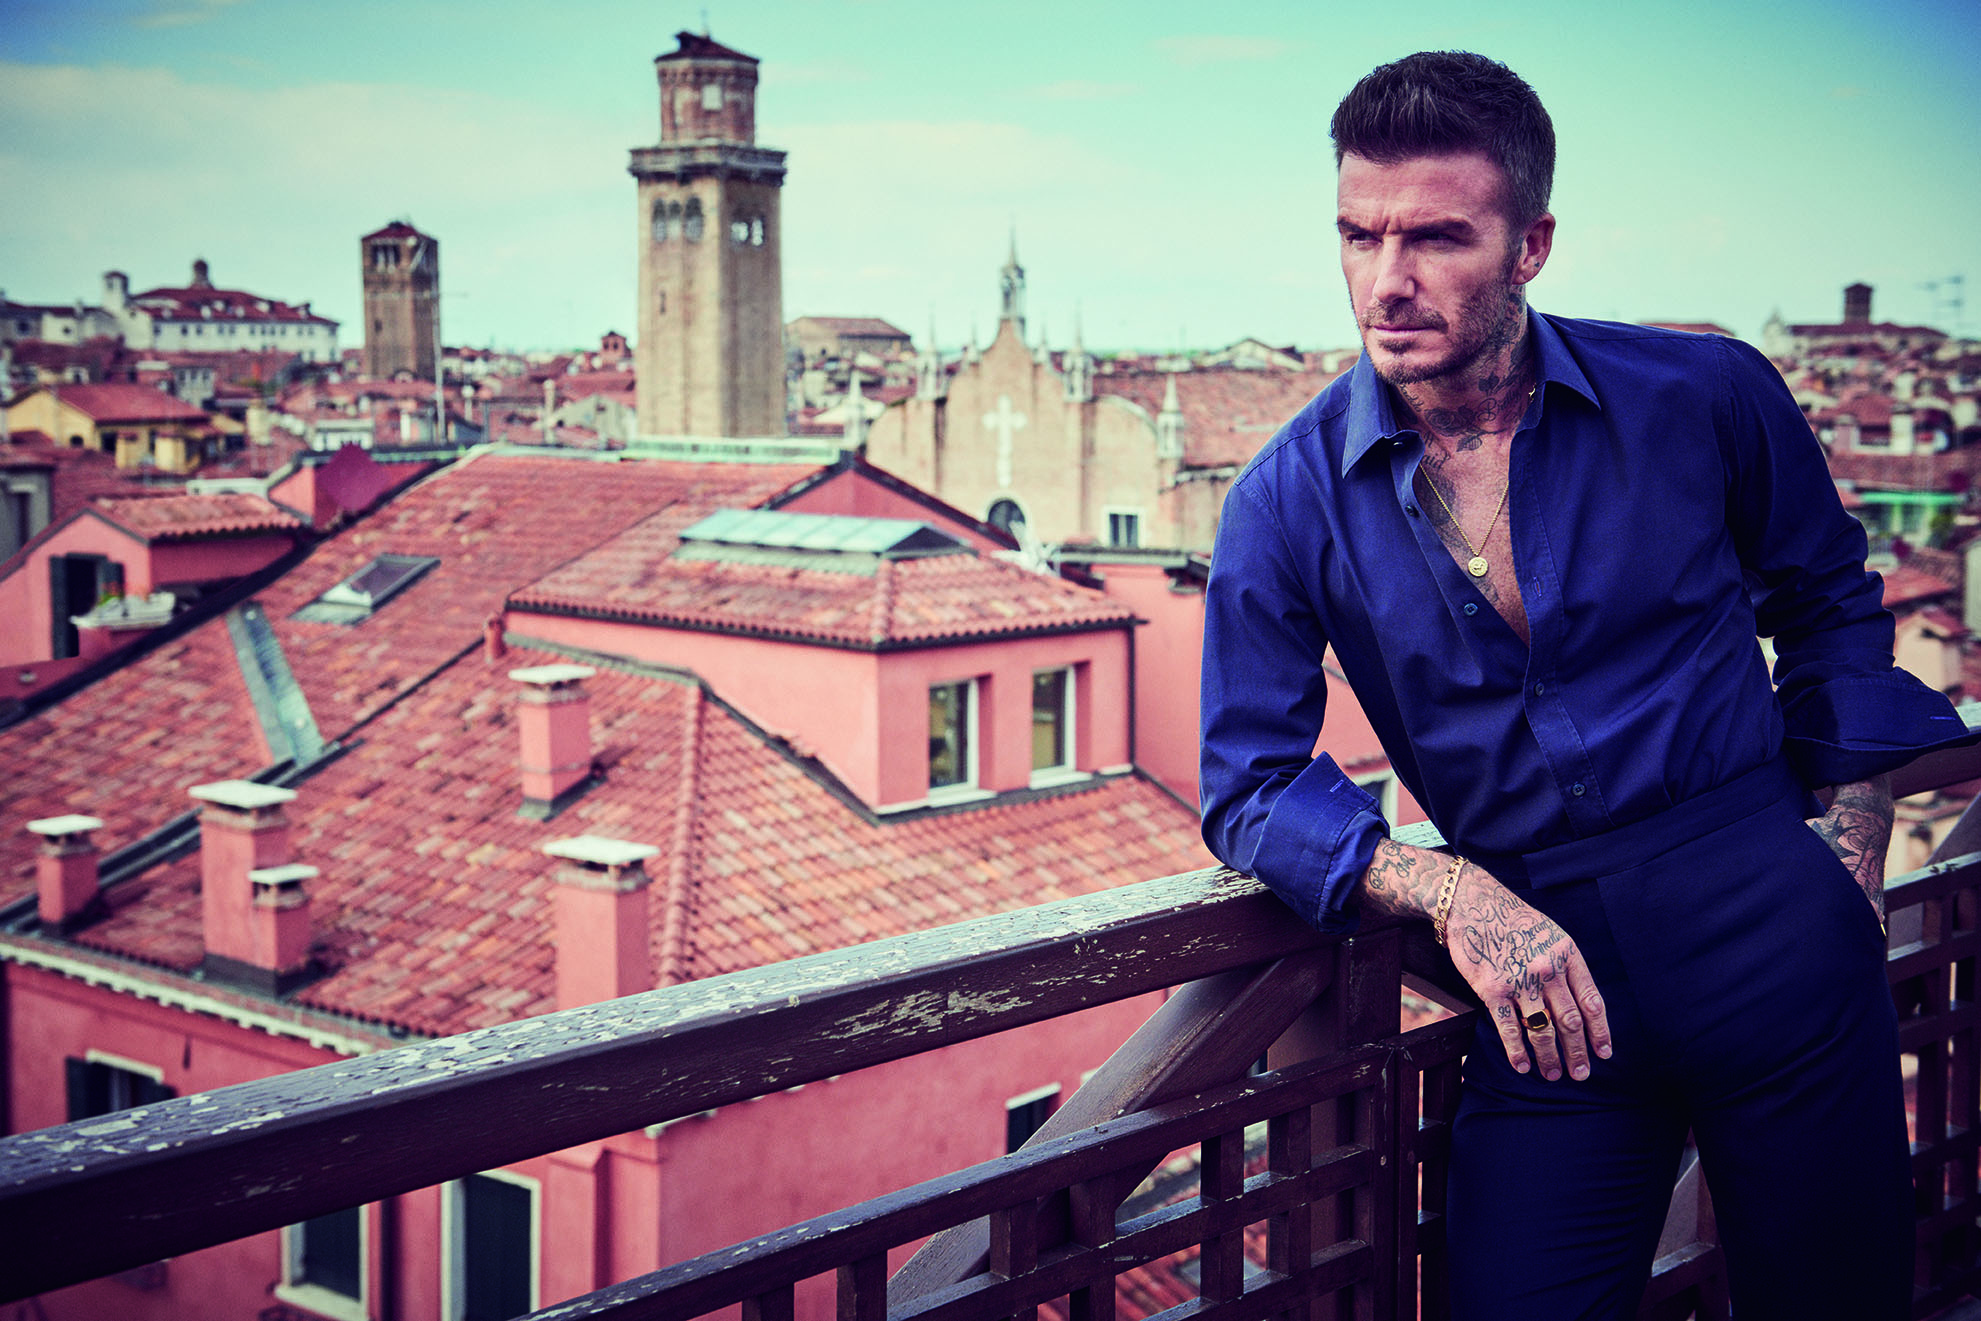 GQ UK - On location in Venice with David Beckham Photographer: Matthew Brookes Model: David Beckham Stylist: Cathy Kasterine Location: Venice, Italy